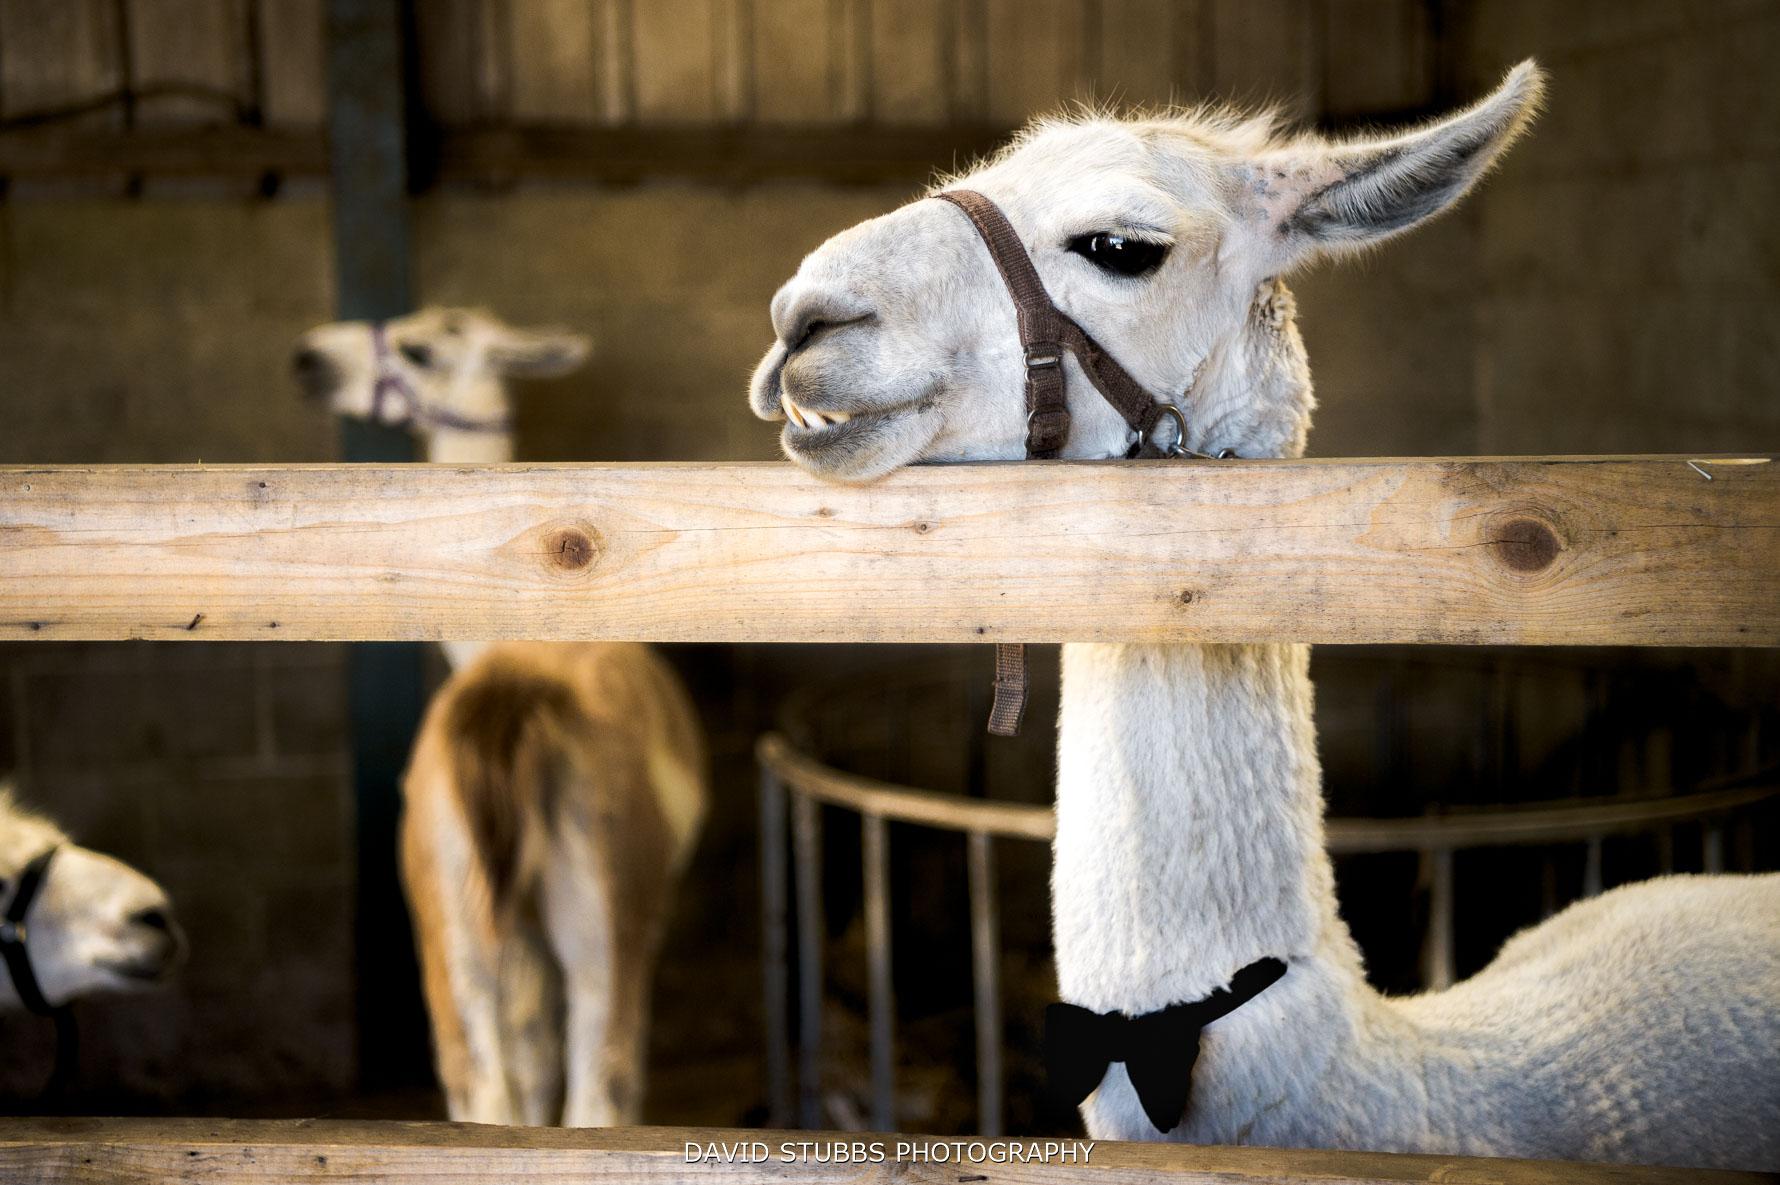 llamas in bow ties at wellbeing farm